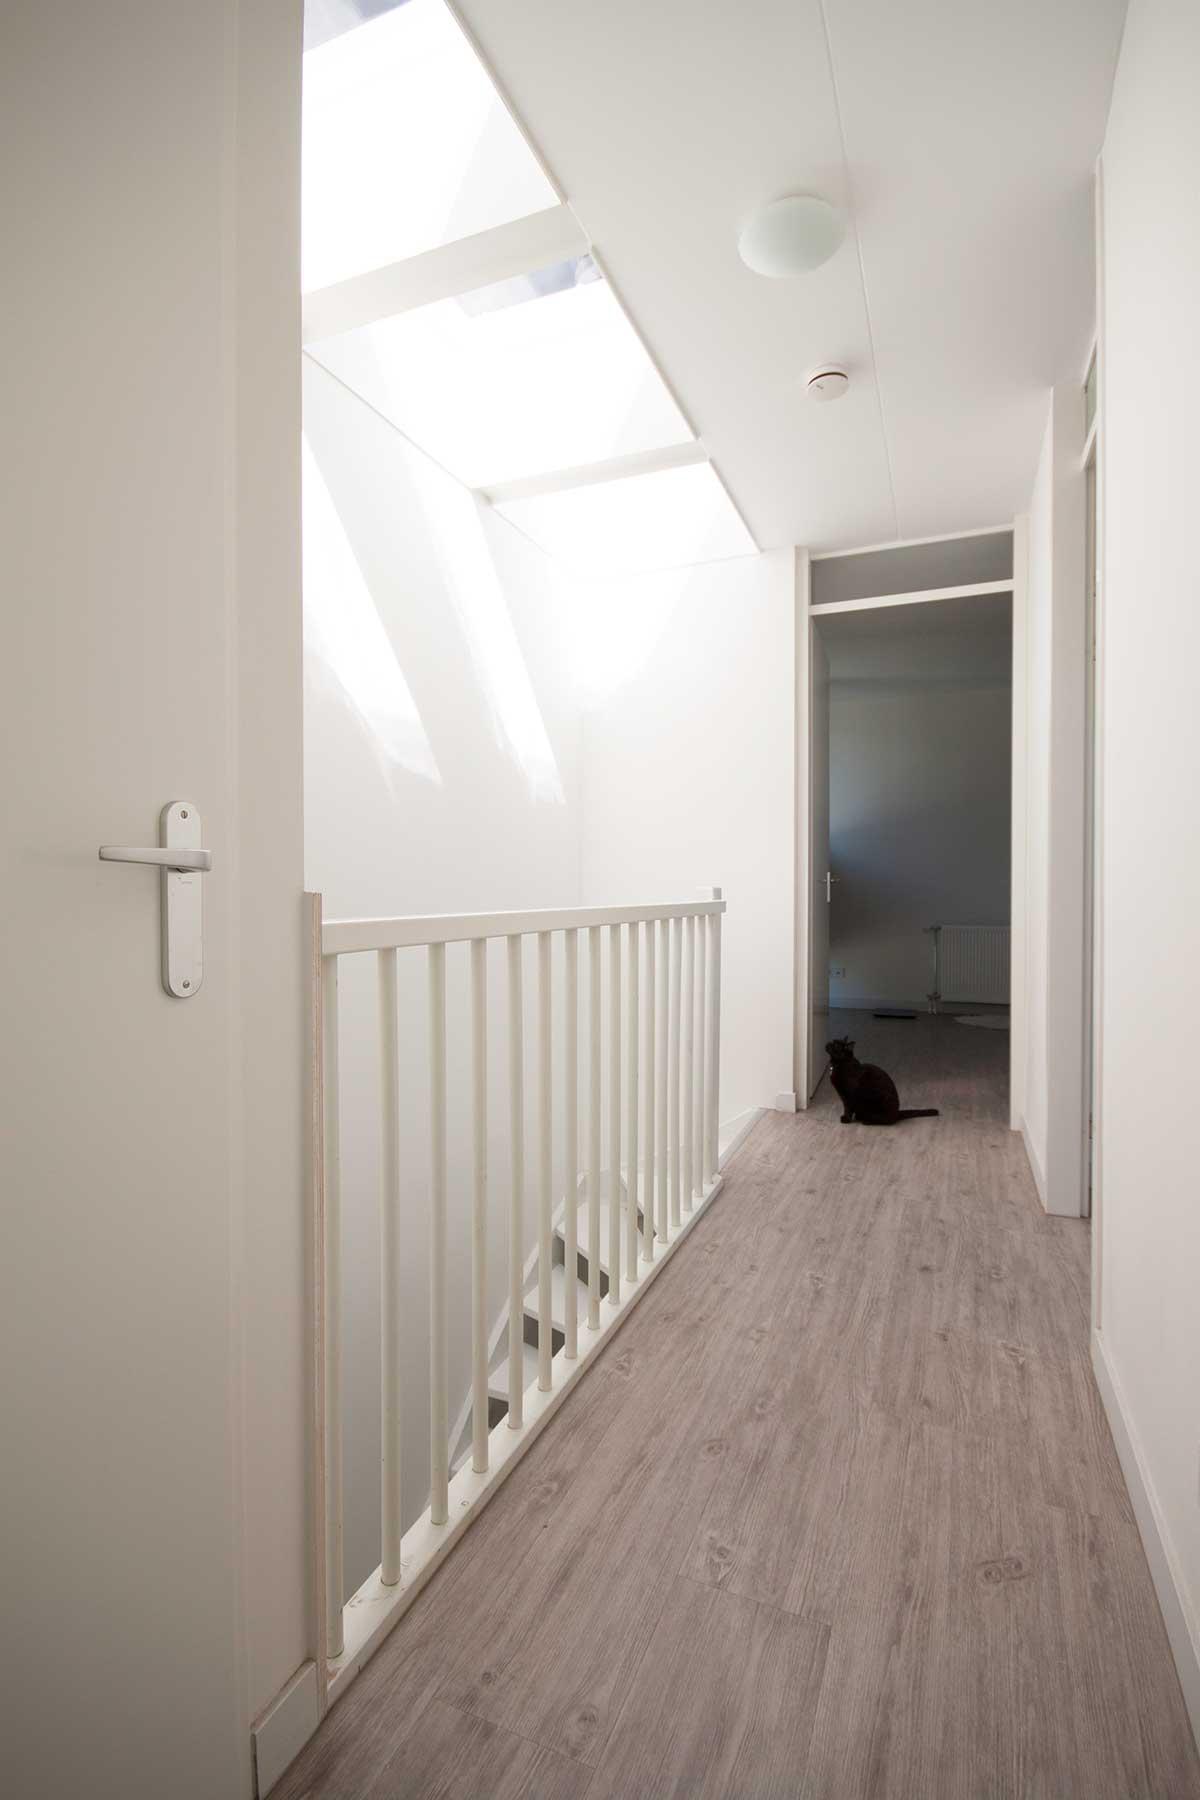 8A-Architecten-datcha-house-2-Lent-09b